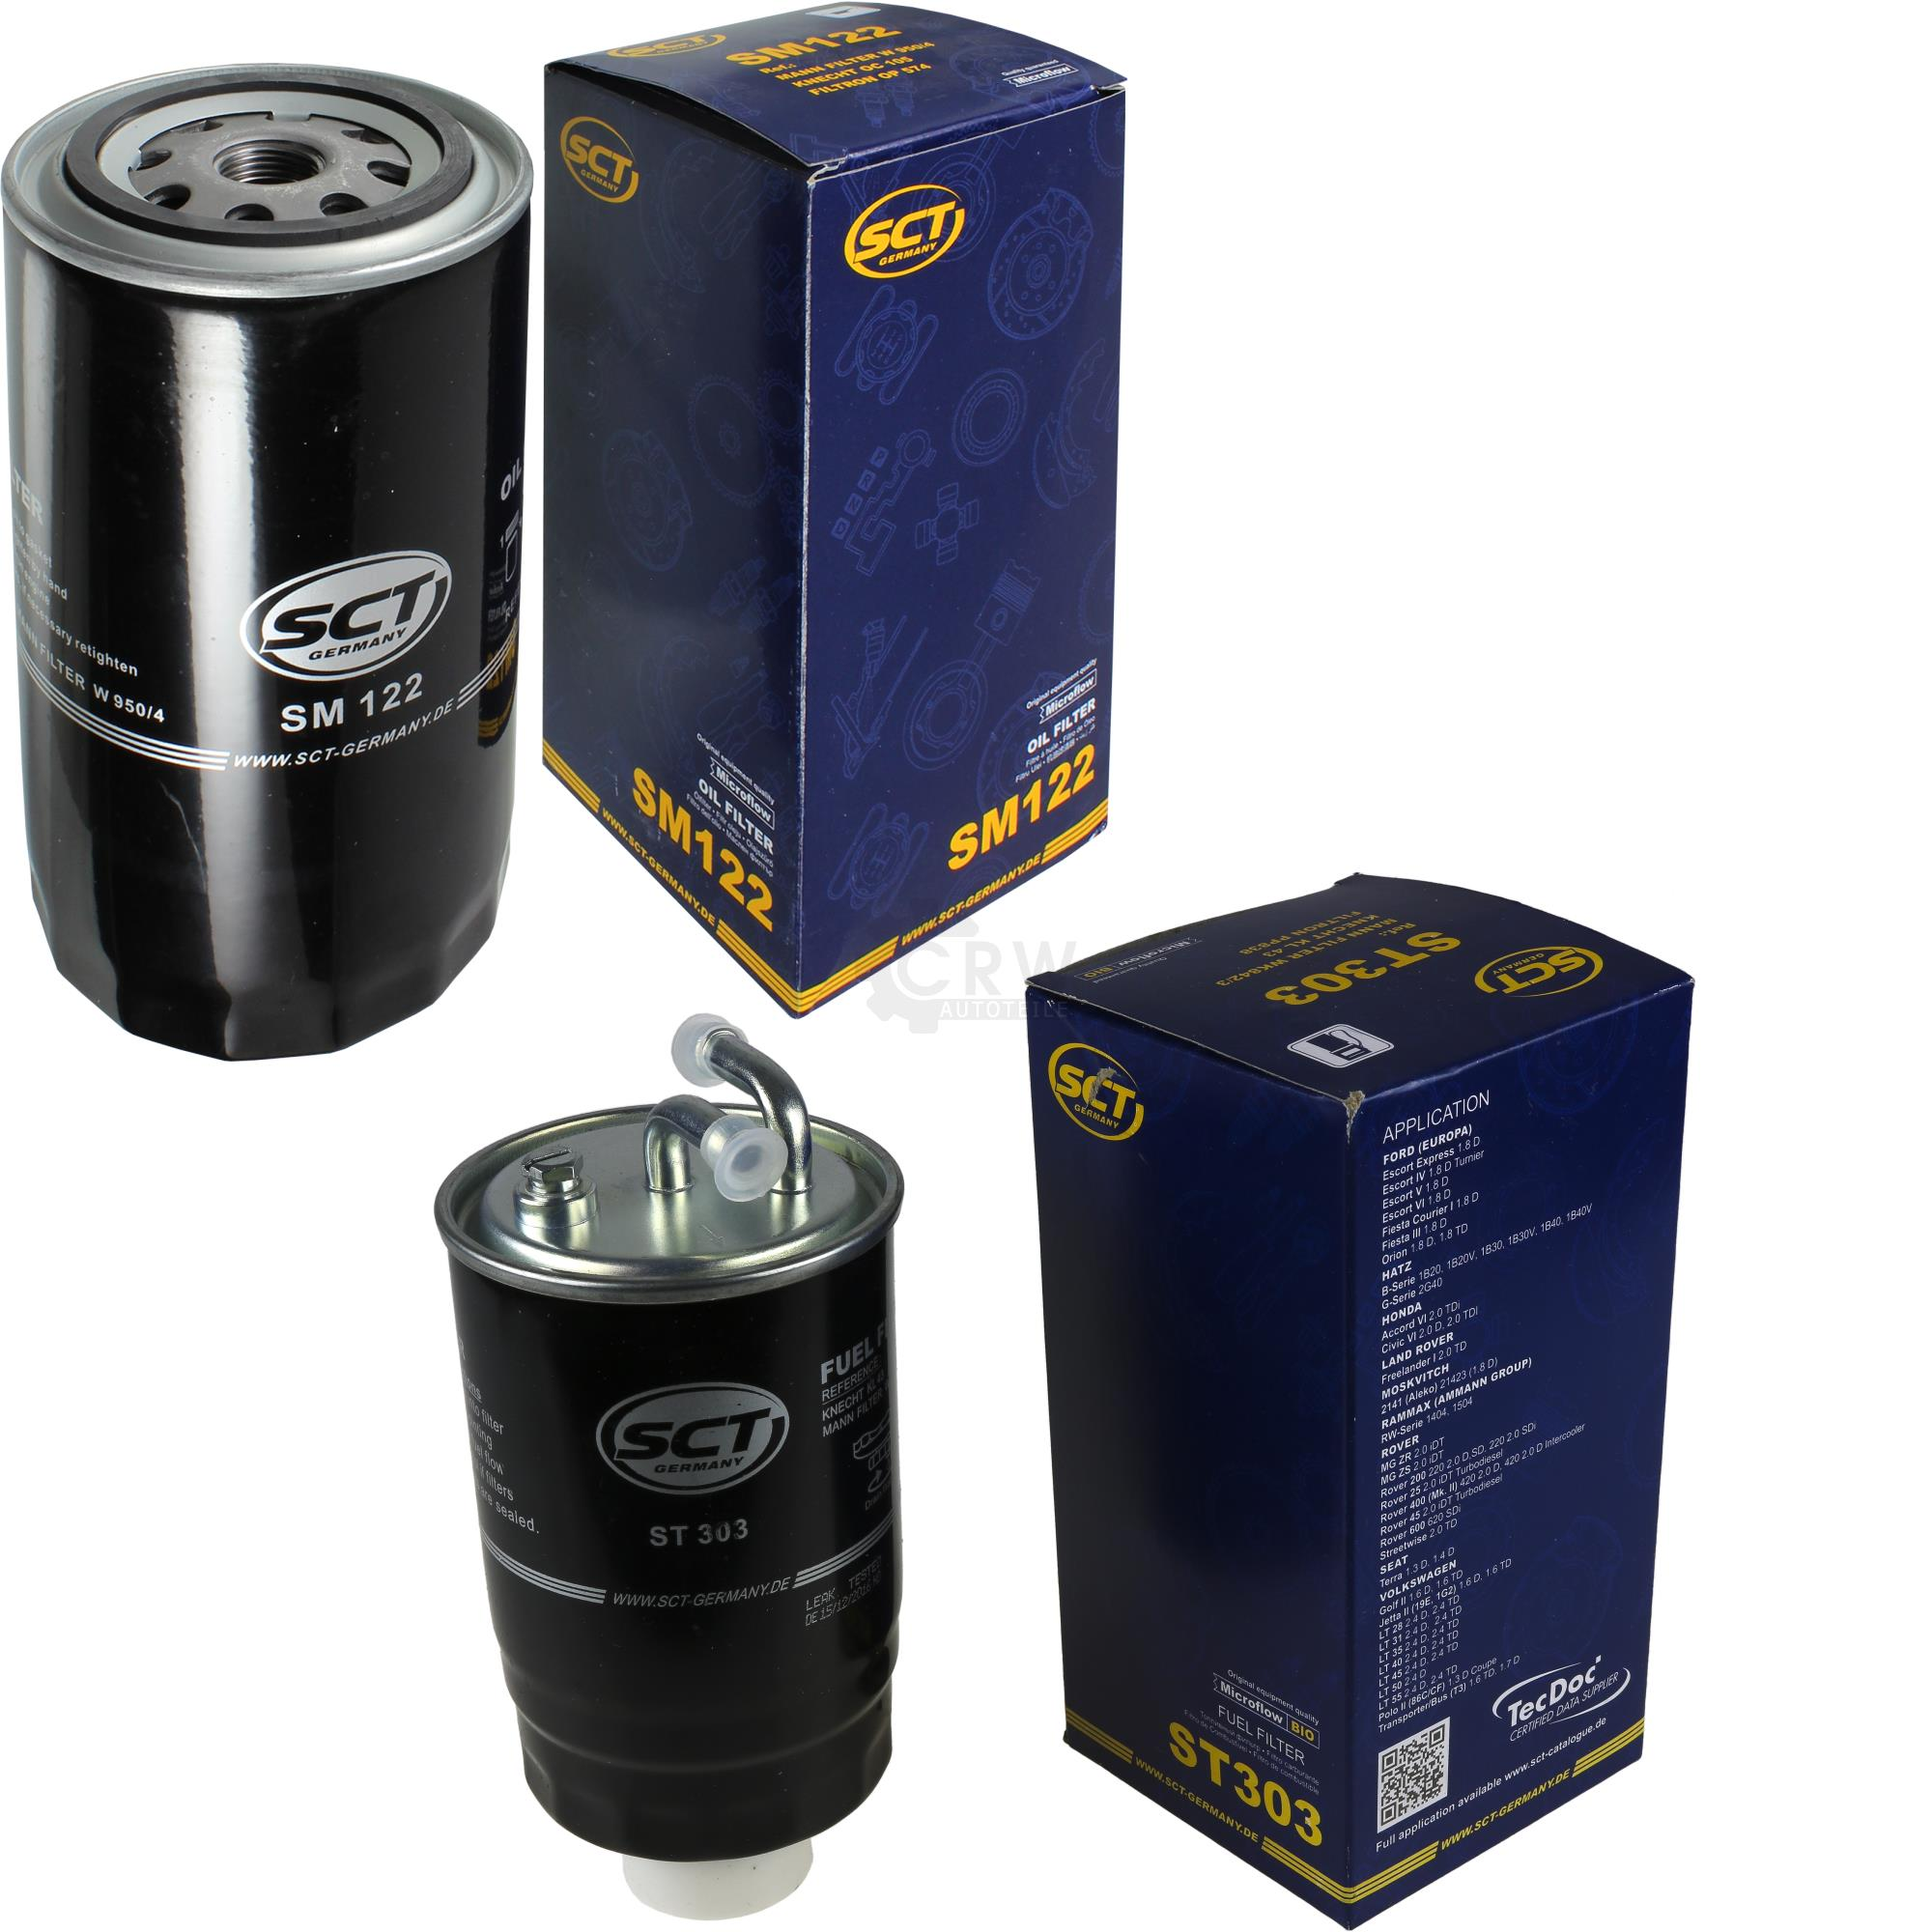 Inspektionspaket Service Kit Filtersatz VW LT 28-35 I Kasten 281-363 Bus 291-512